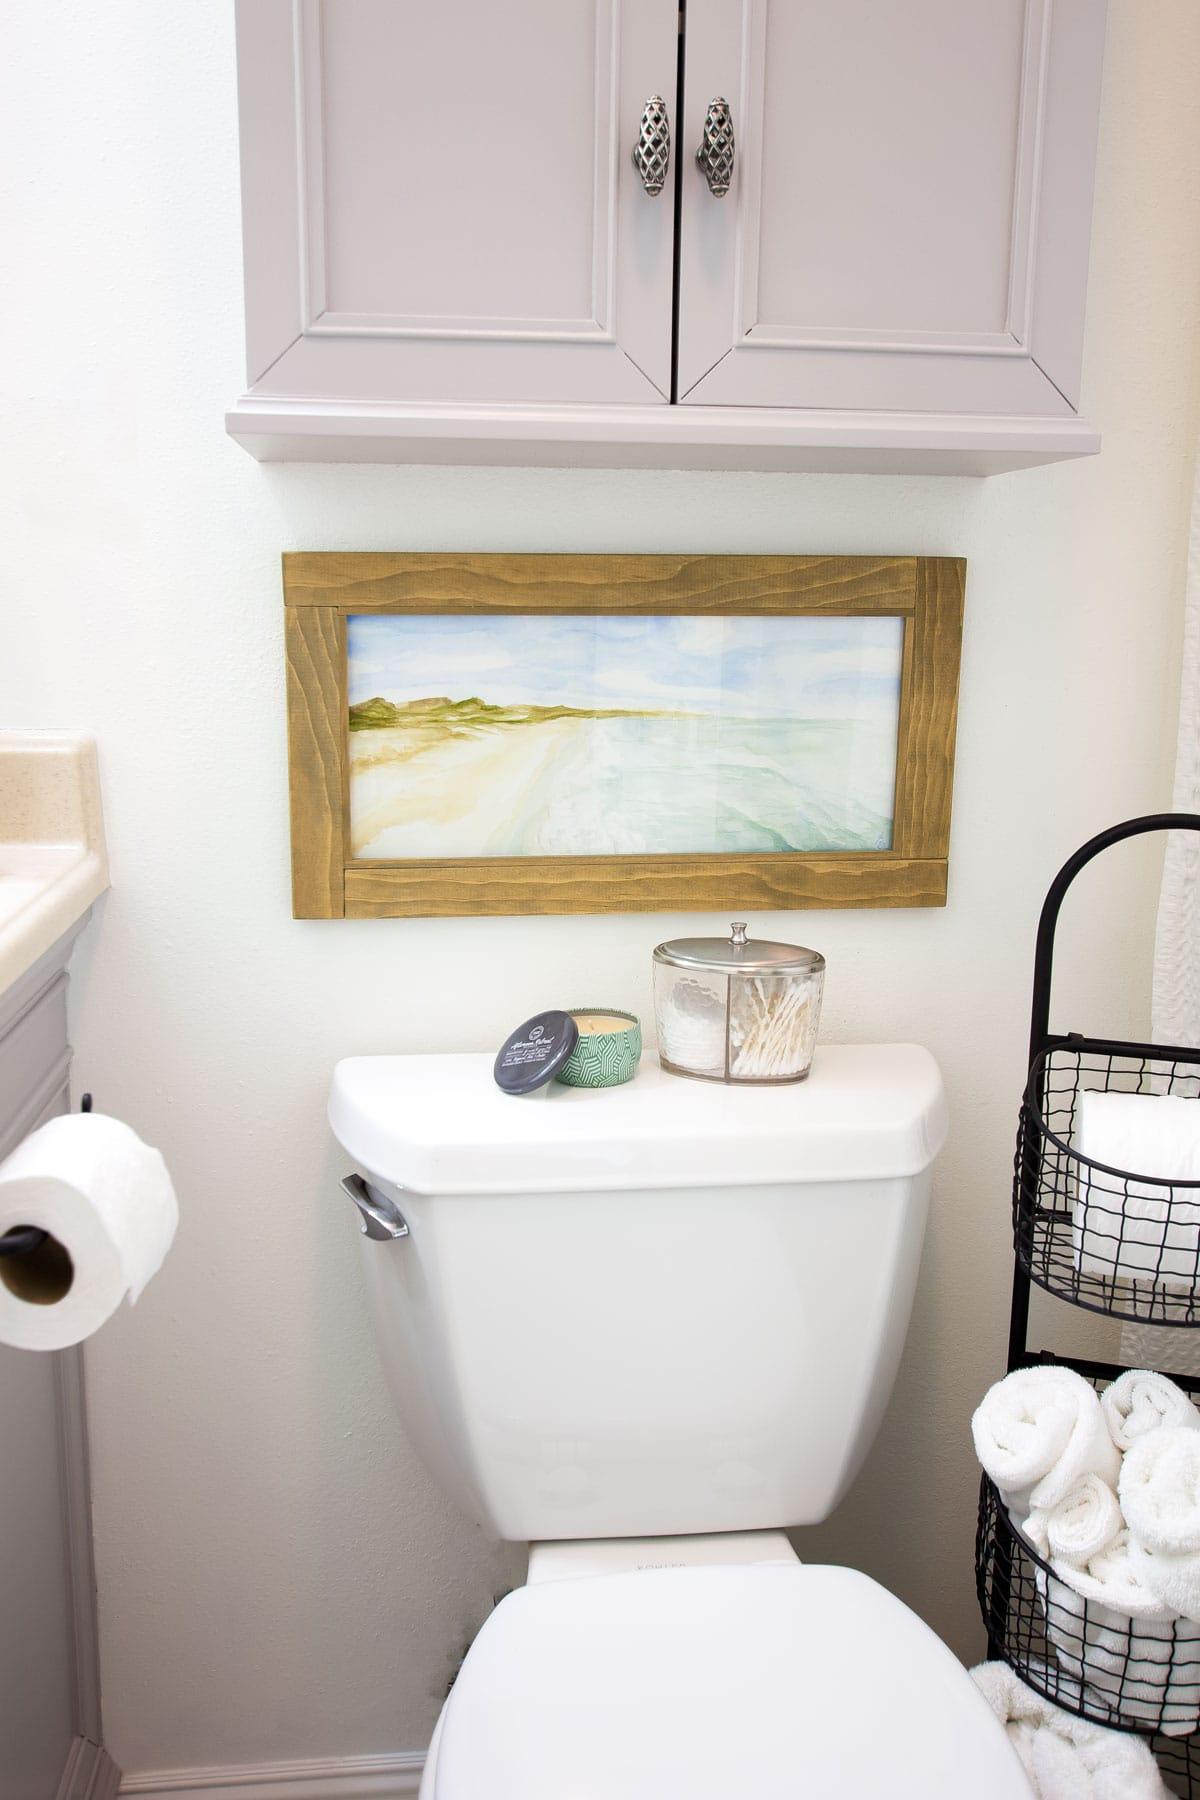 watercolor painting above toilet in bathroom